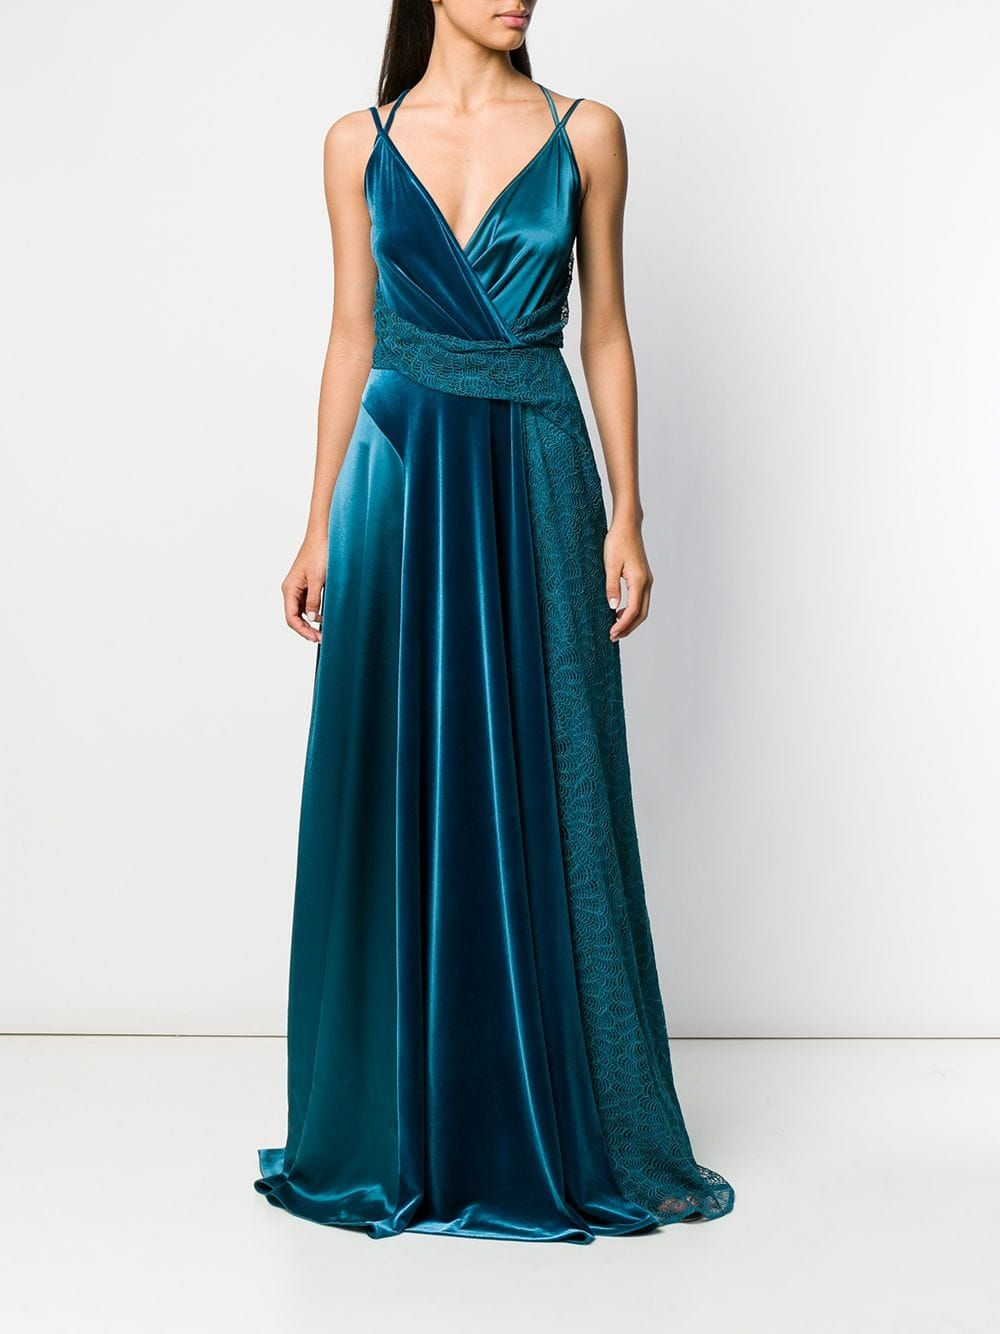 Talbot Runhof Solberg Dress Farfetch Dresses Ball Dresses Yule Ball Dresses [ 1334 x 1000 Pixel ]